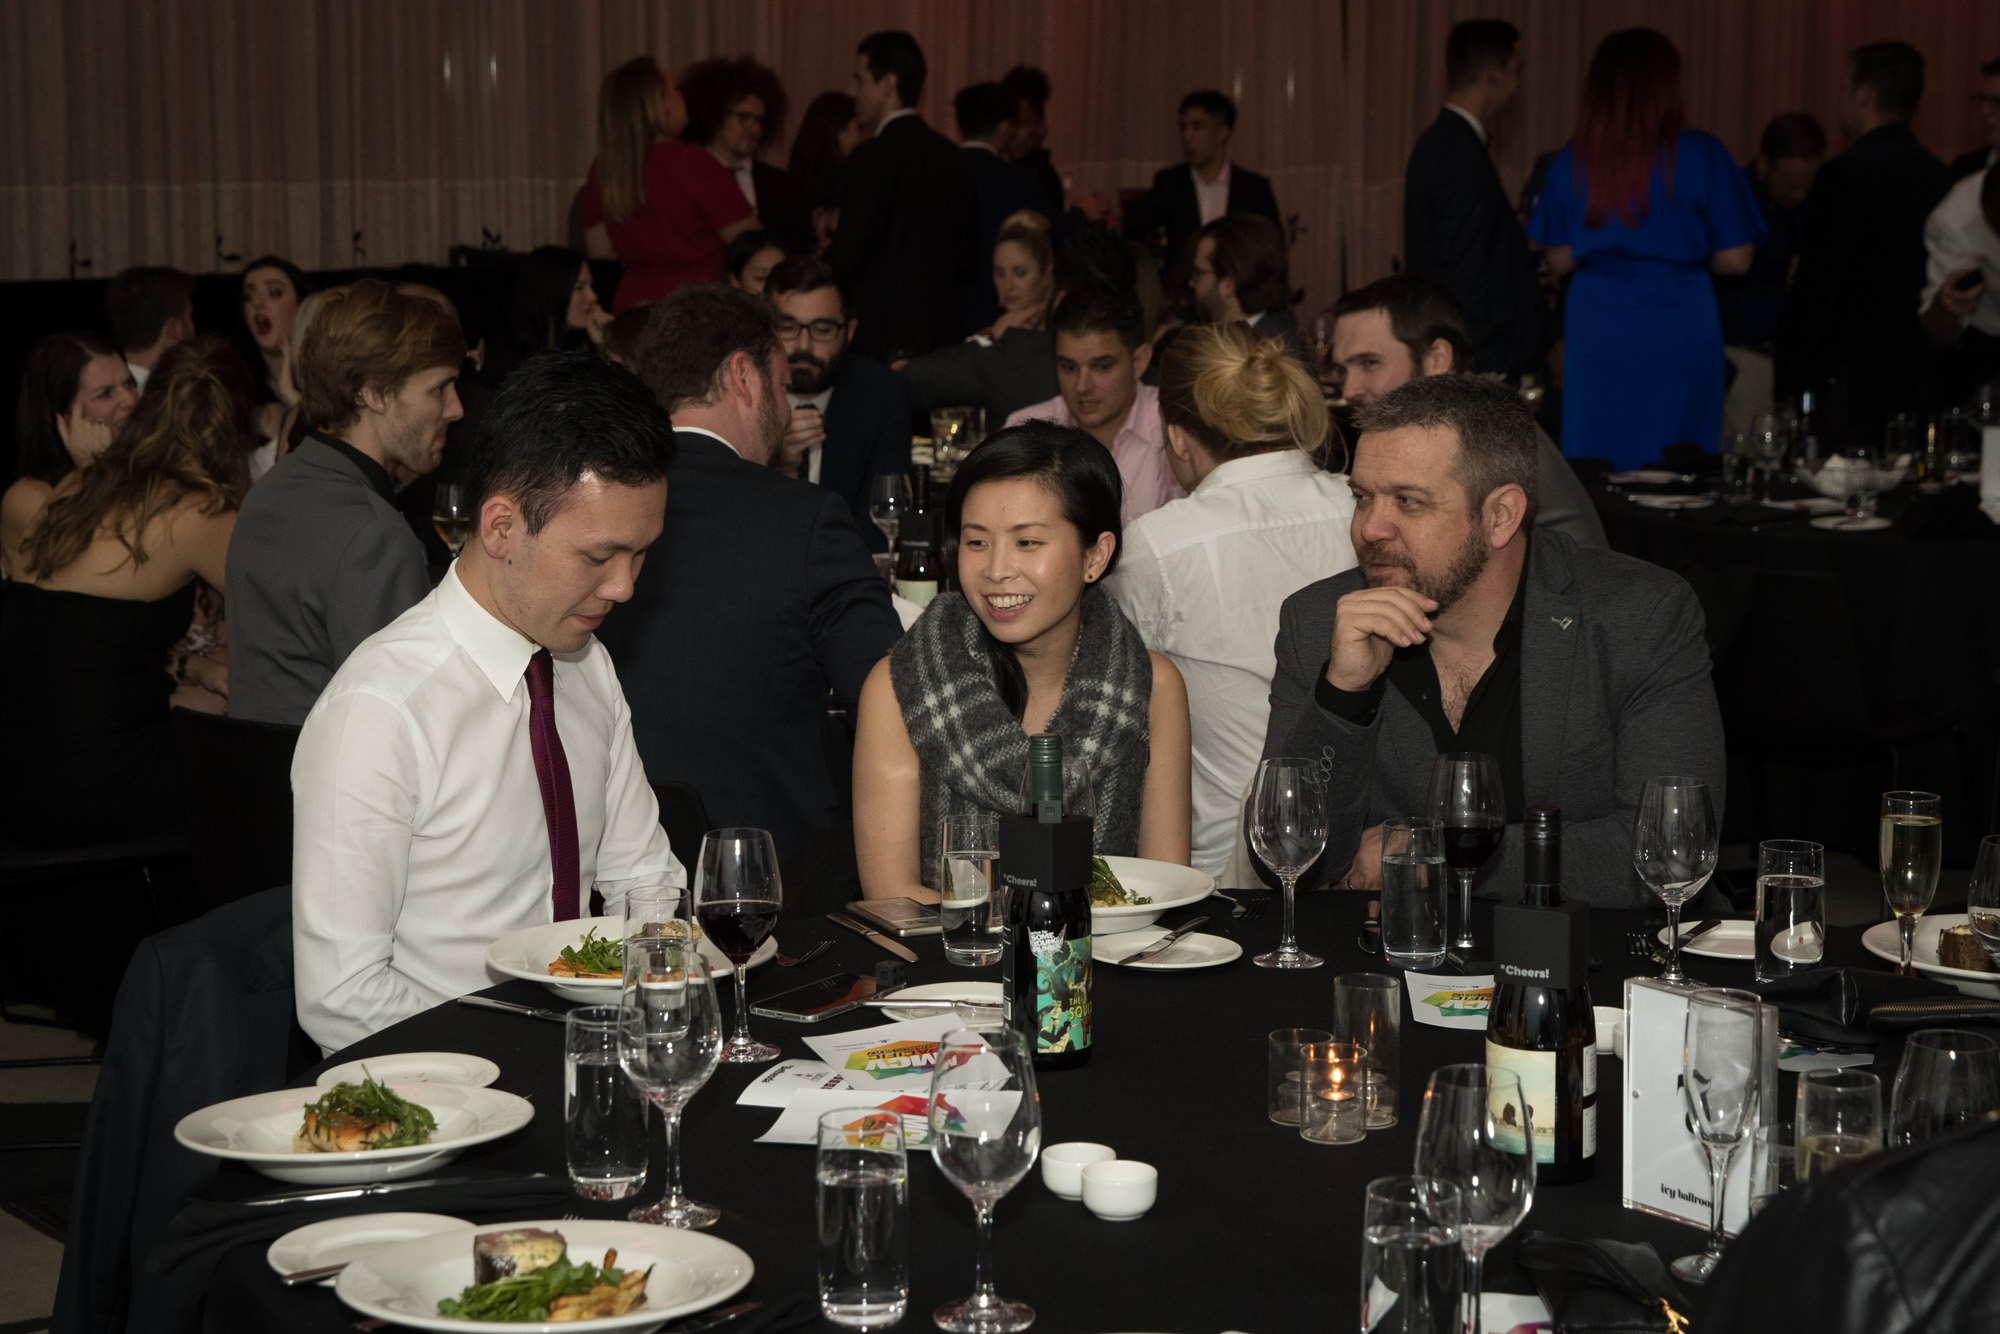 MCV_Pacific_Awards_1_June_17_PS_106.jpg